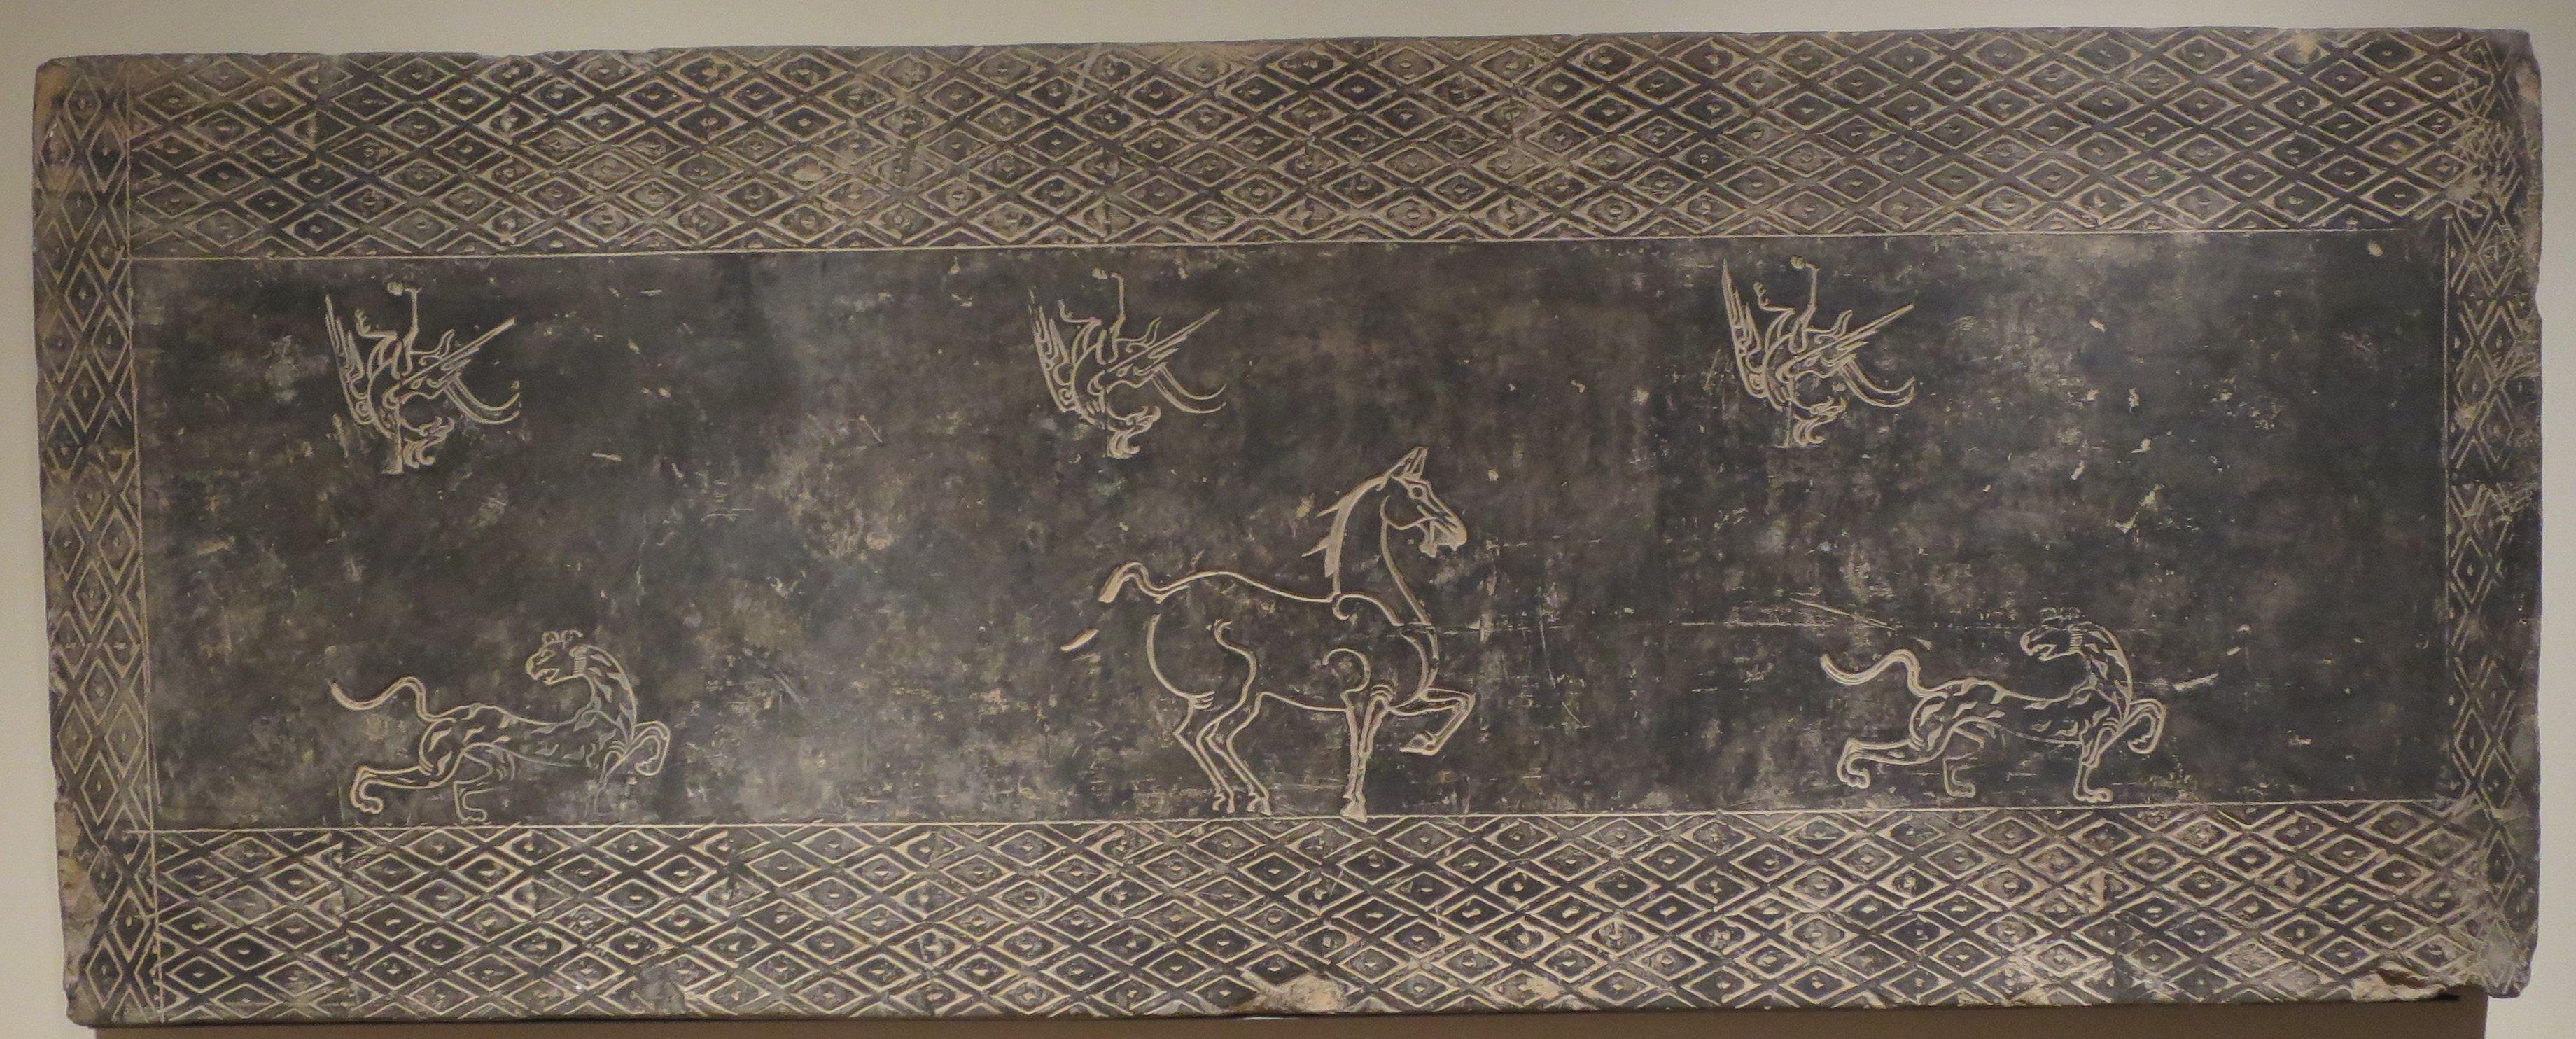 Filetomb Wall Tile China Western Han Dynasty Dayton Art